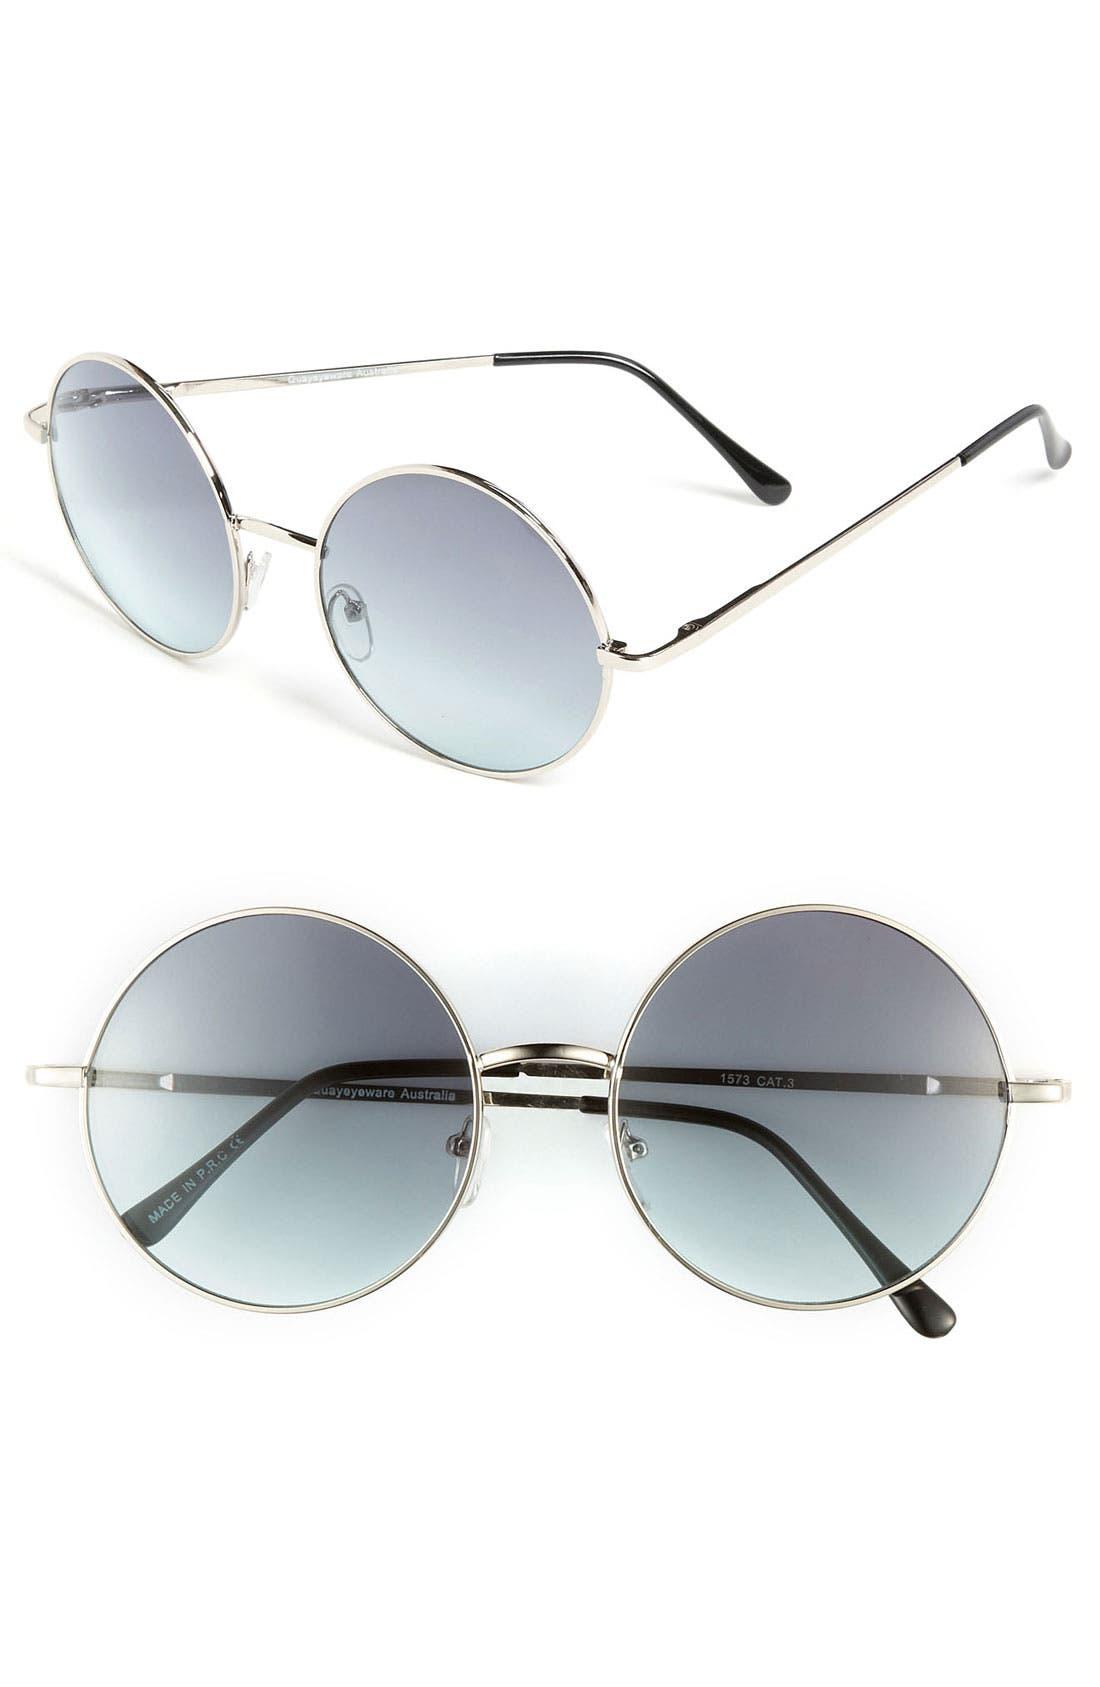 Main Image - Quay Round Retro Sunglasses